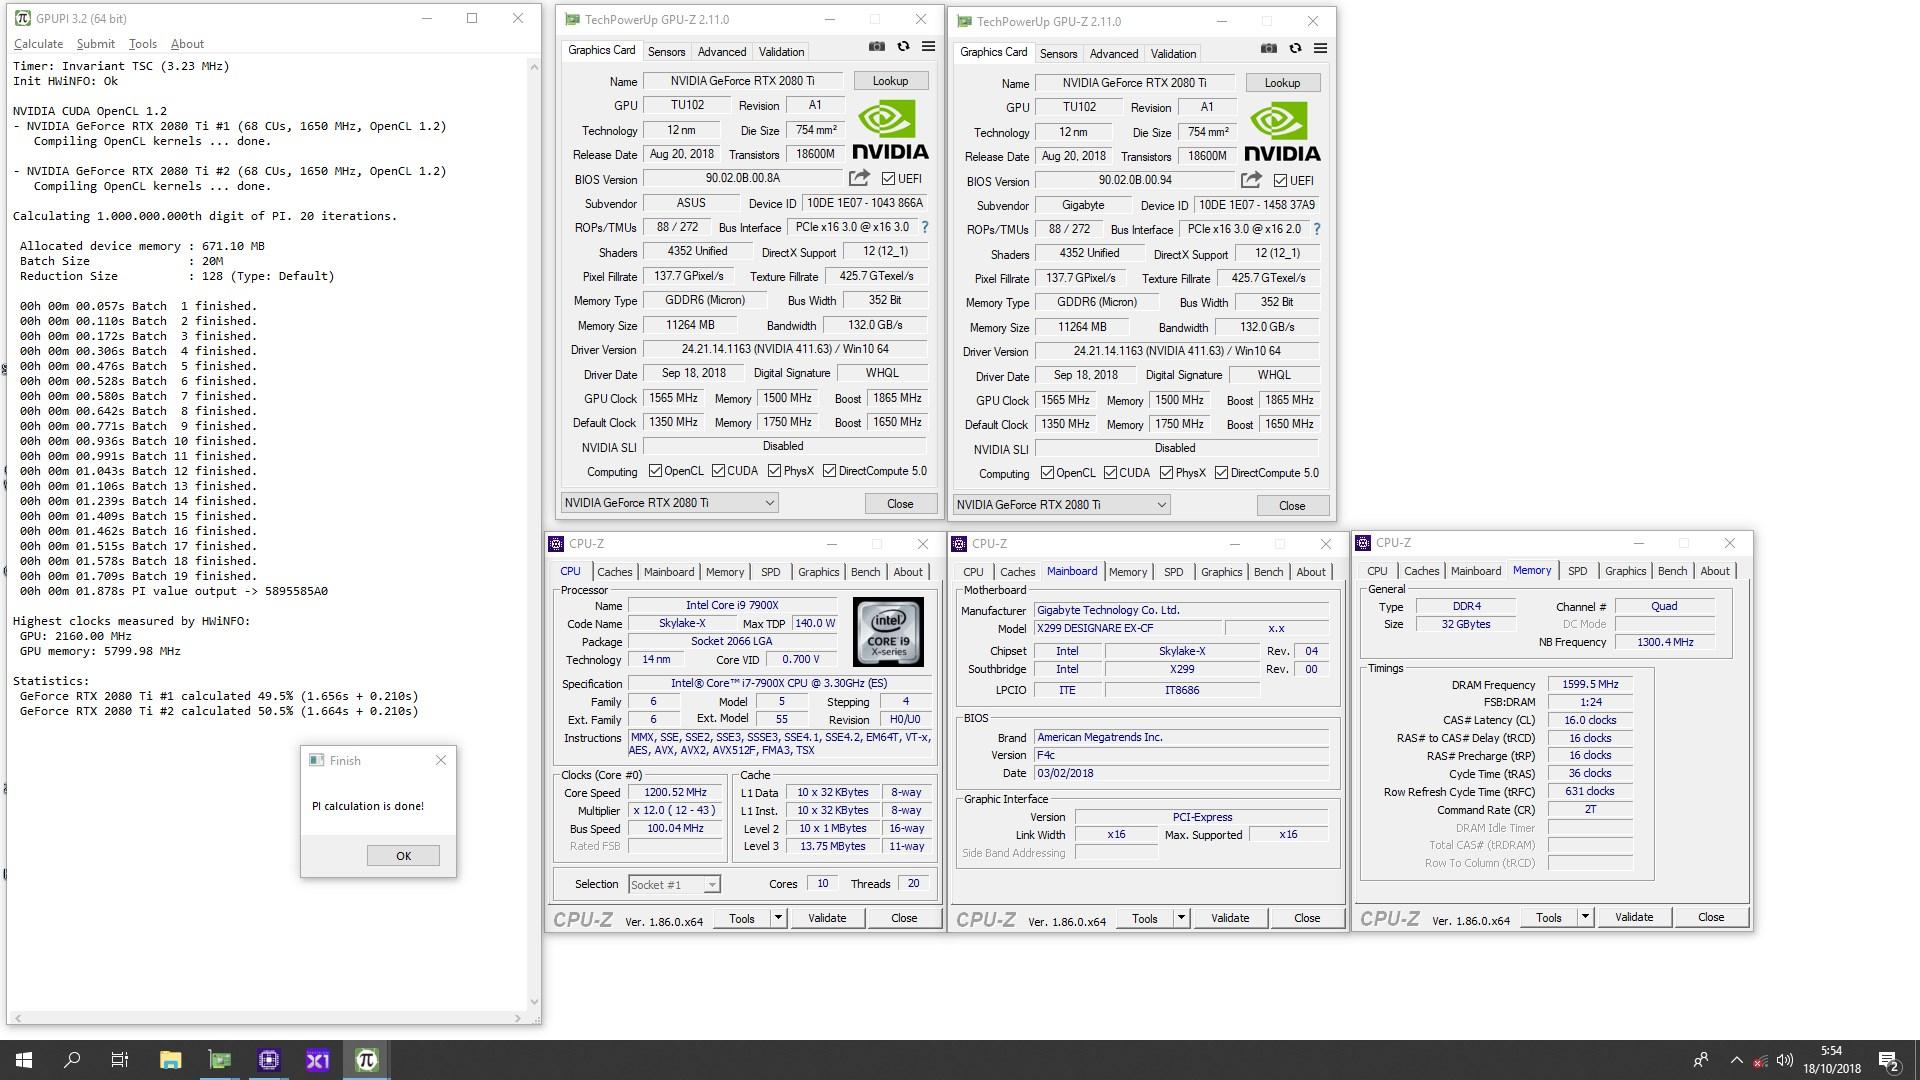 Lucky_n00b`s GPUPI - 1B score: 1sec 878ms with a GeForce RTX 2080 Ti